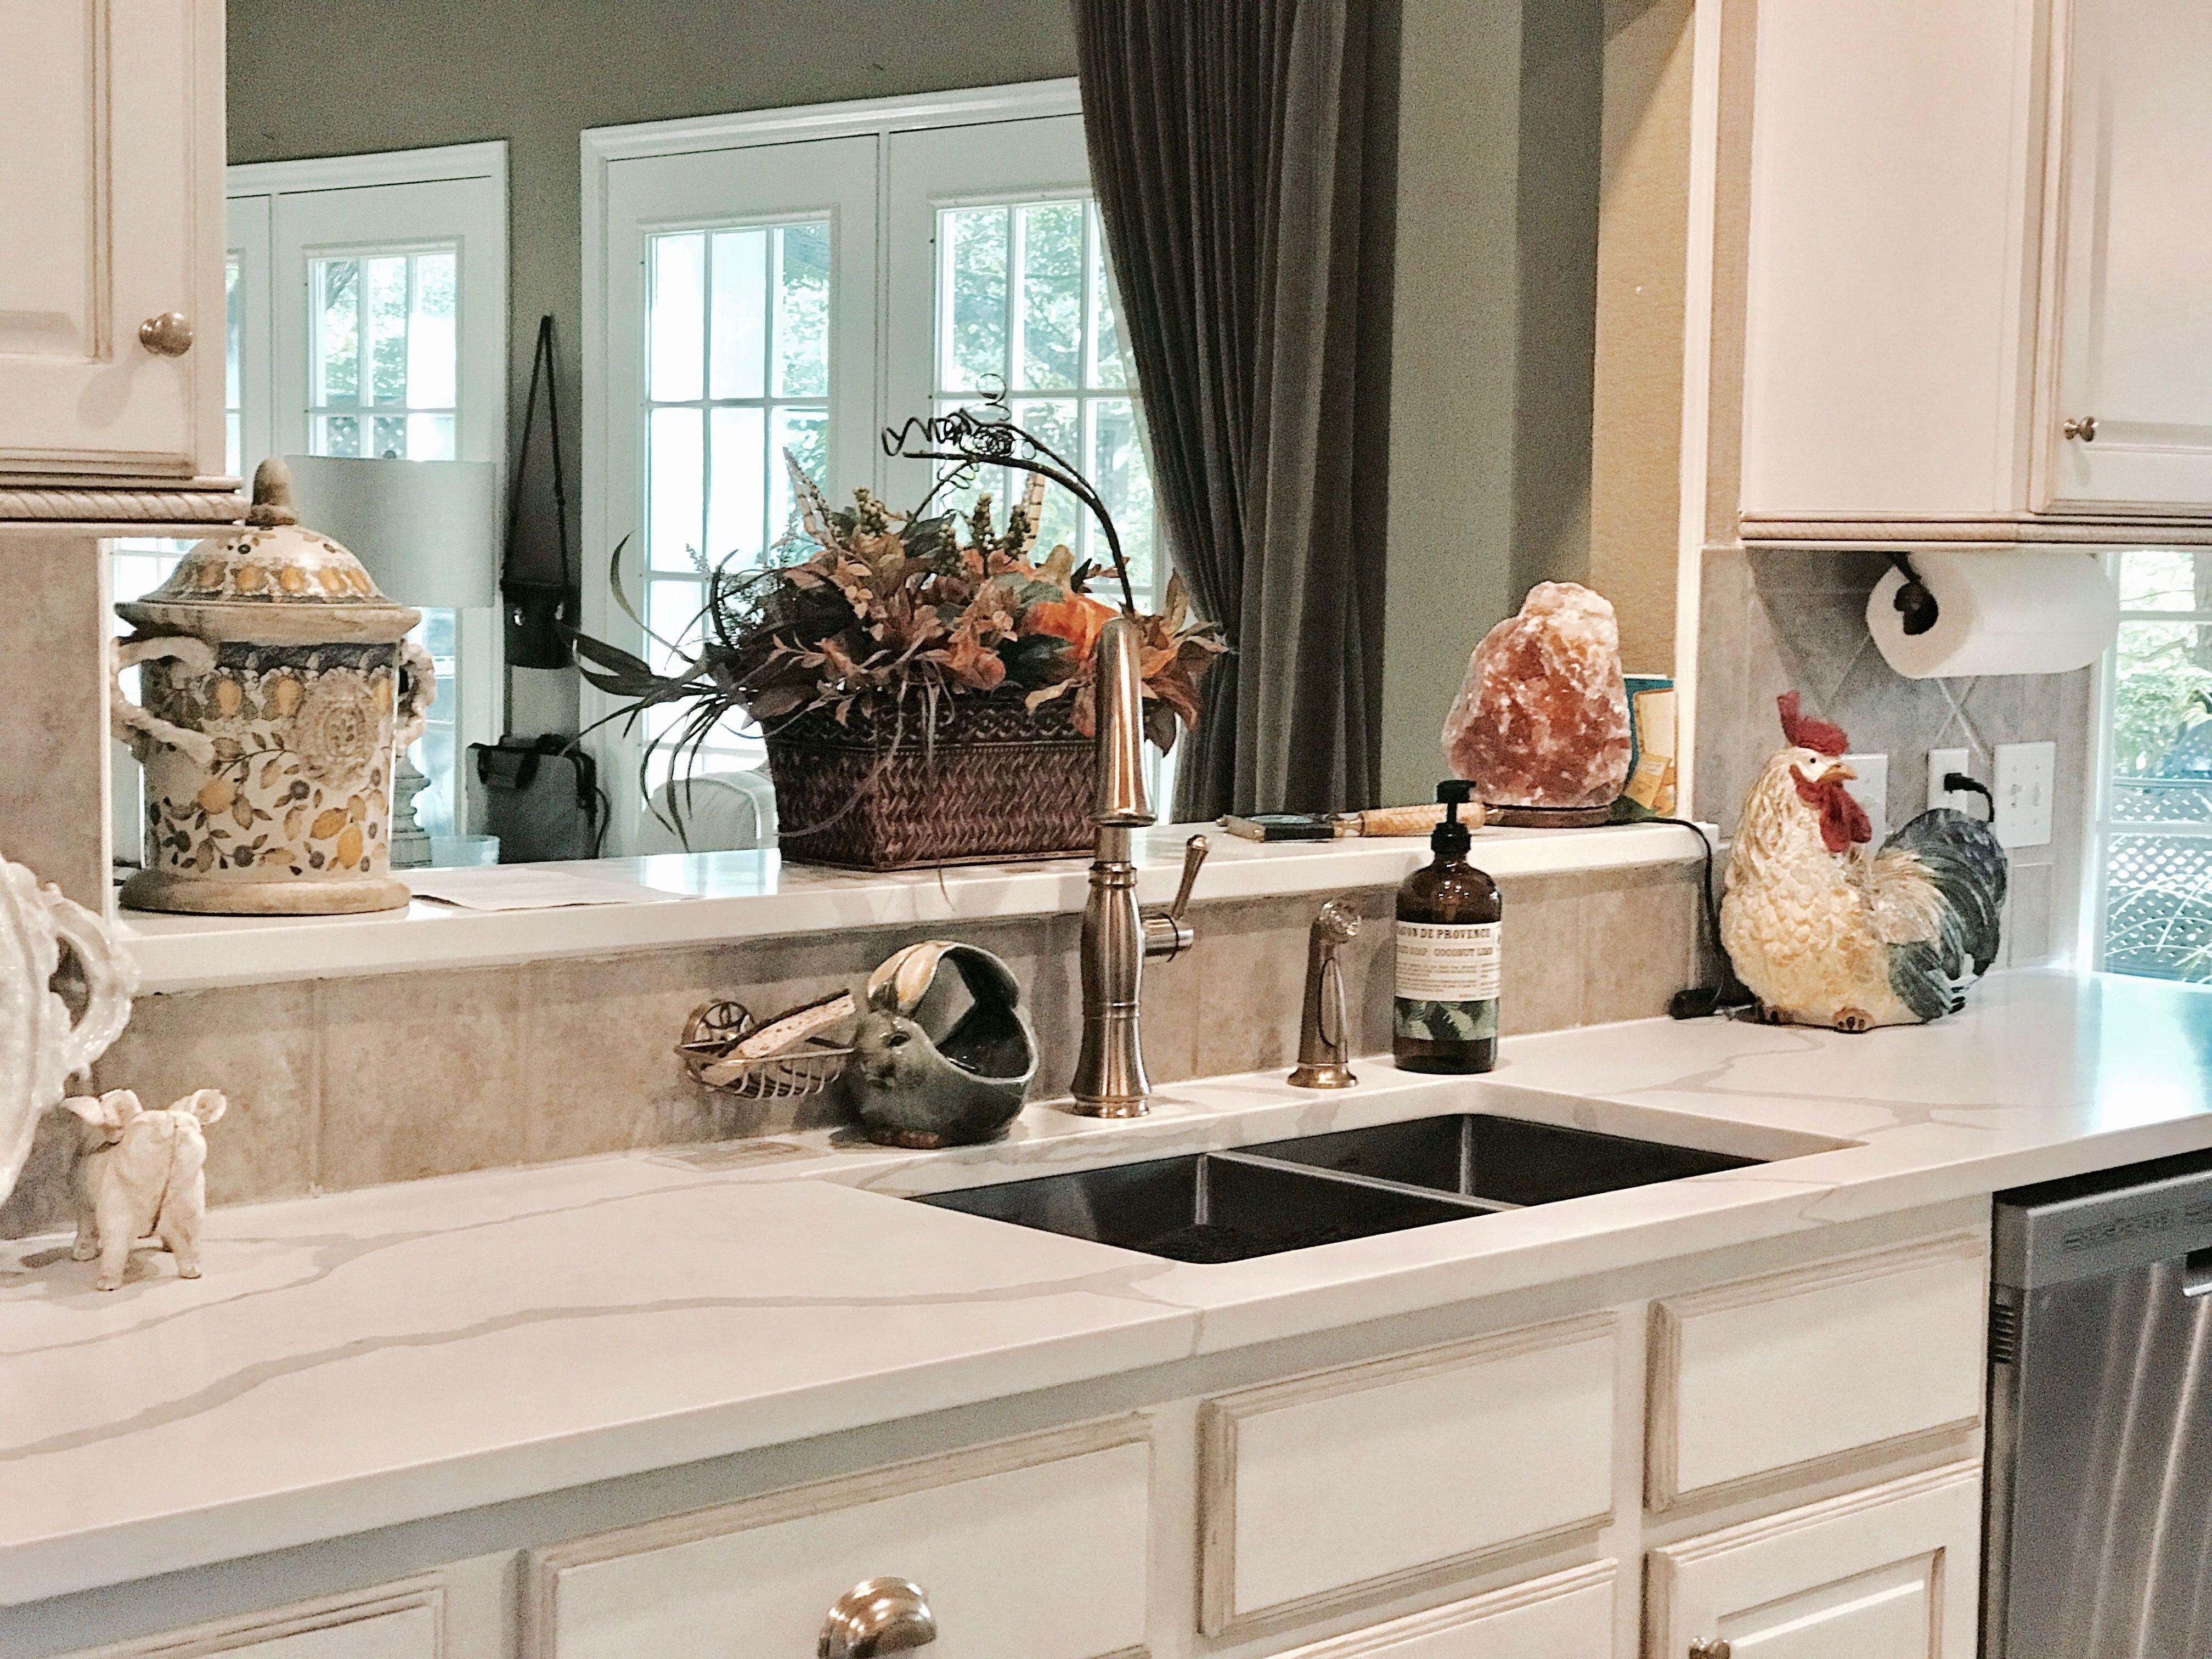 Newly updated kitchen quartz counter tops champagne bronze pull